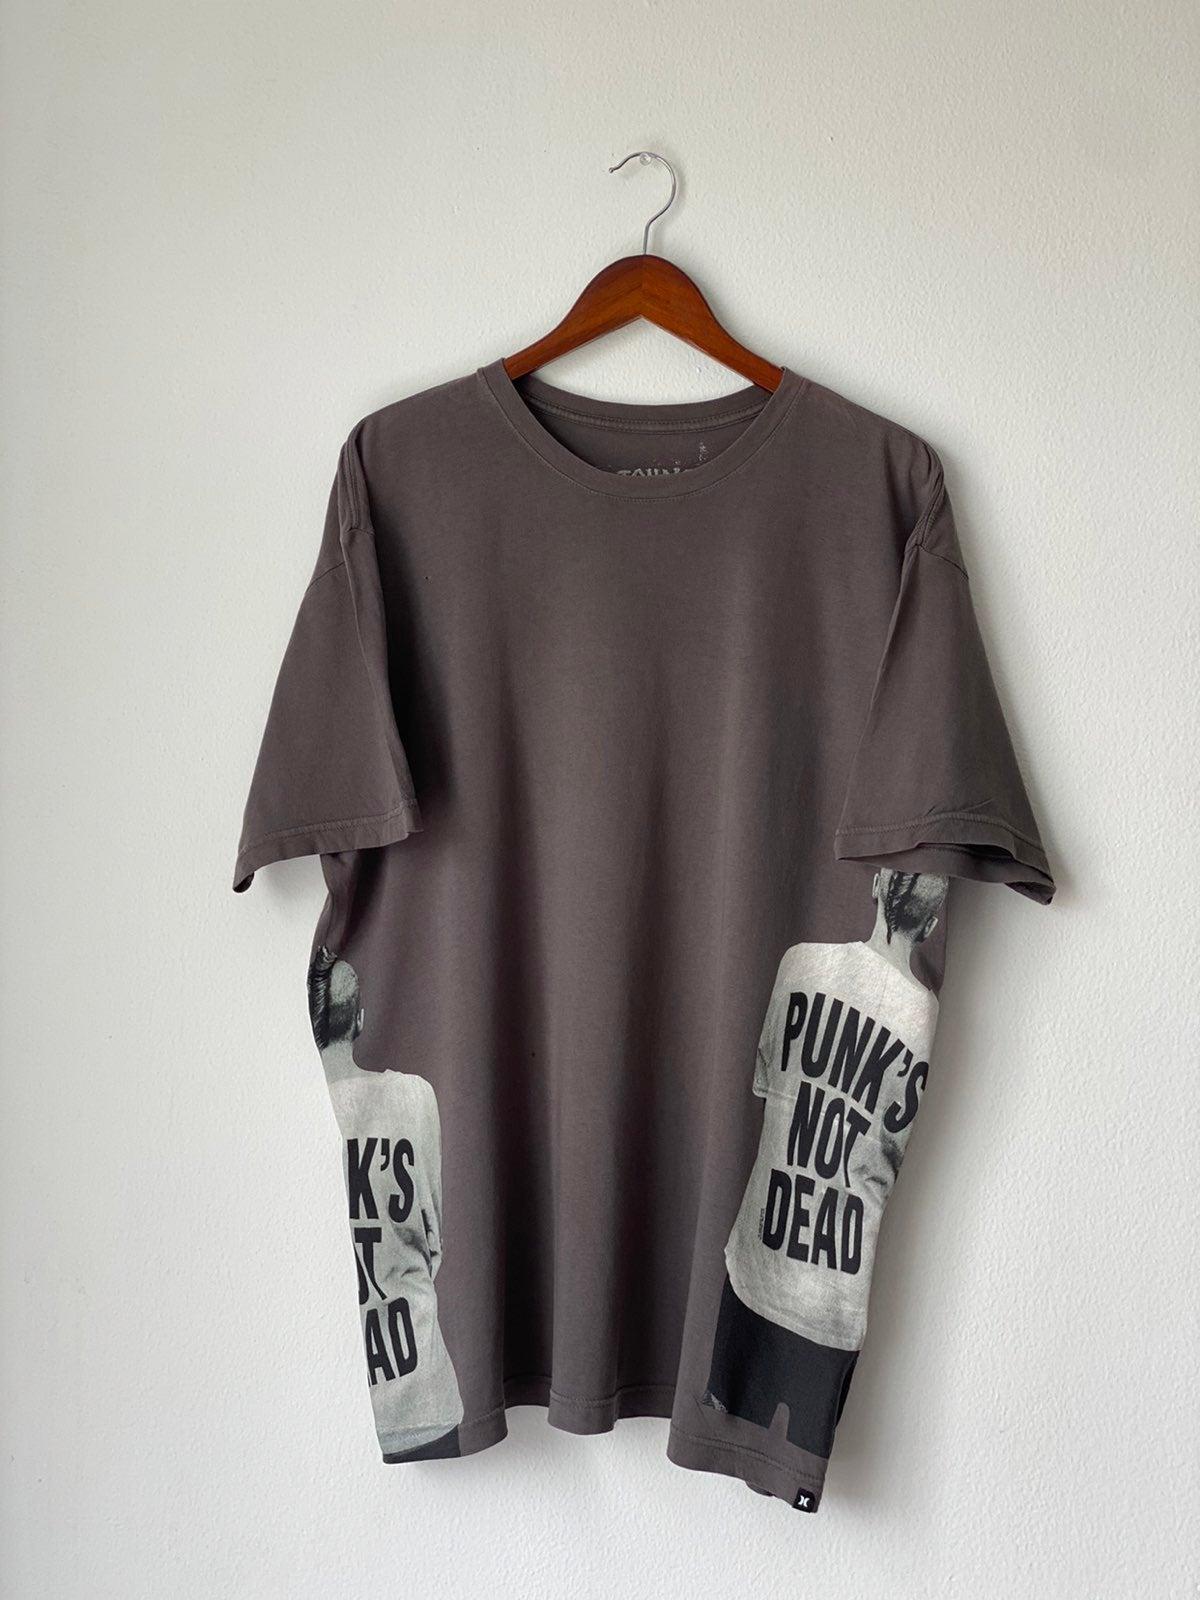 Hurley x Lisa Johnson Shirt Sz XL